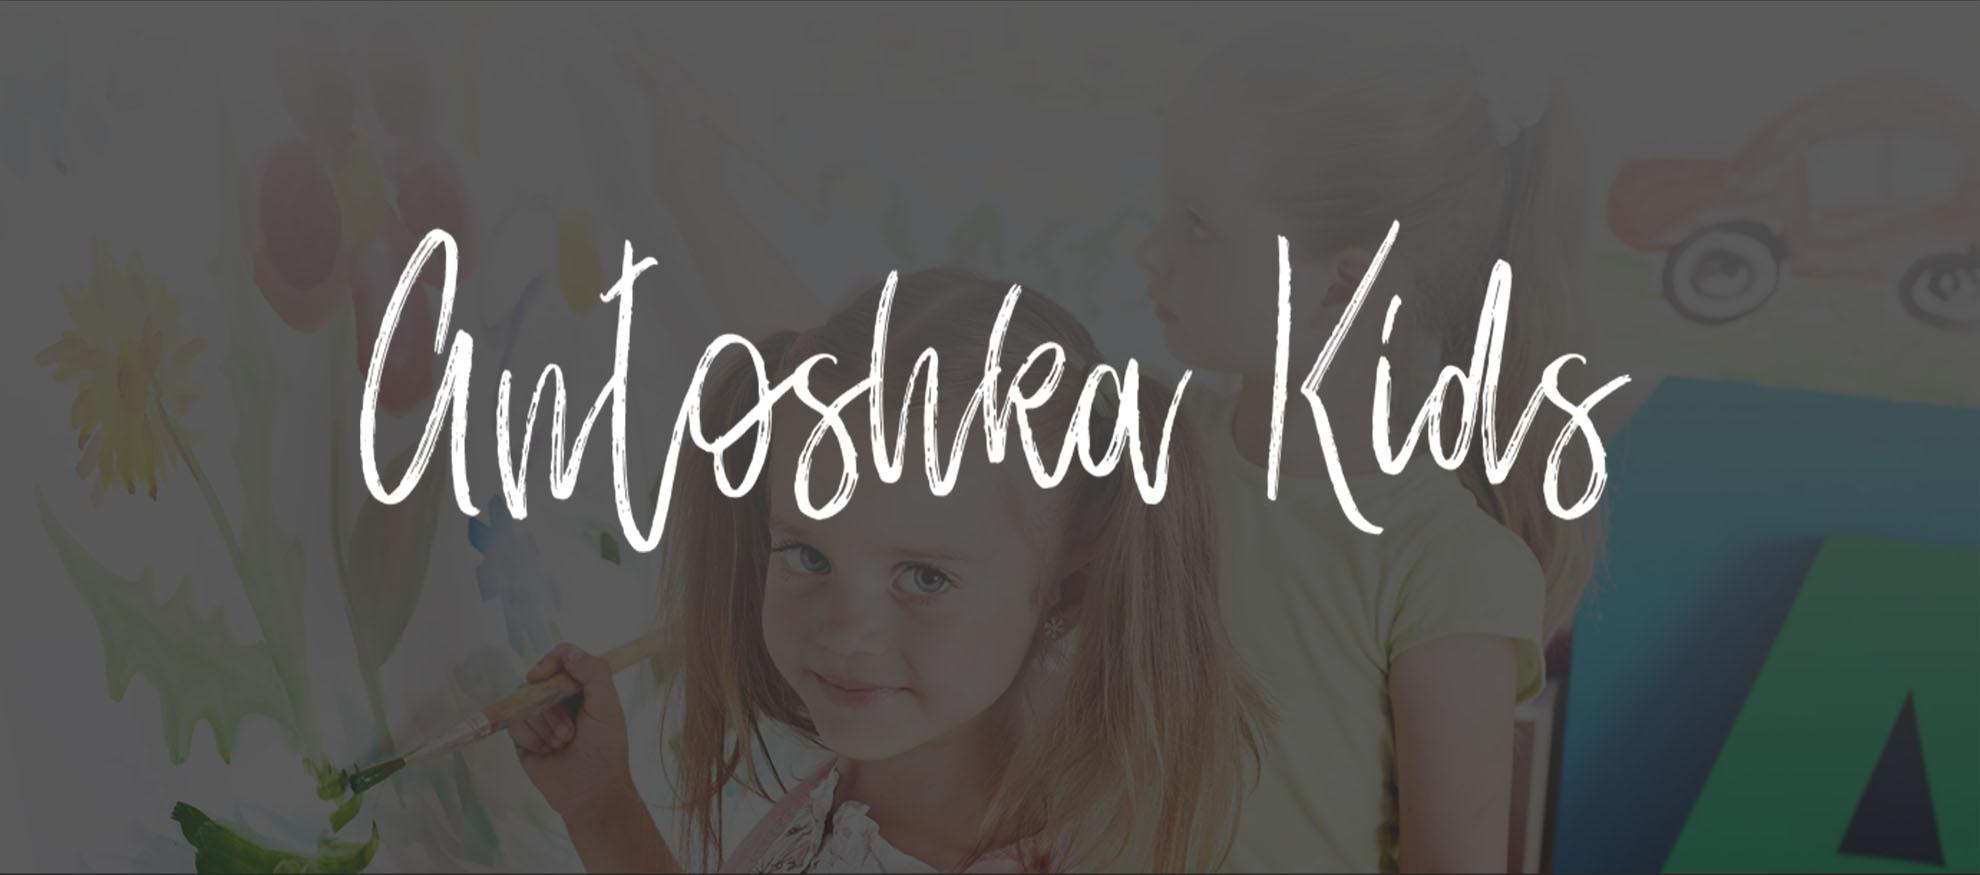 antoshka kids